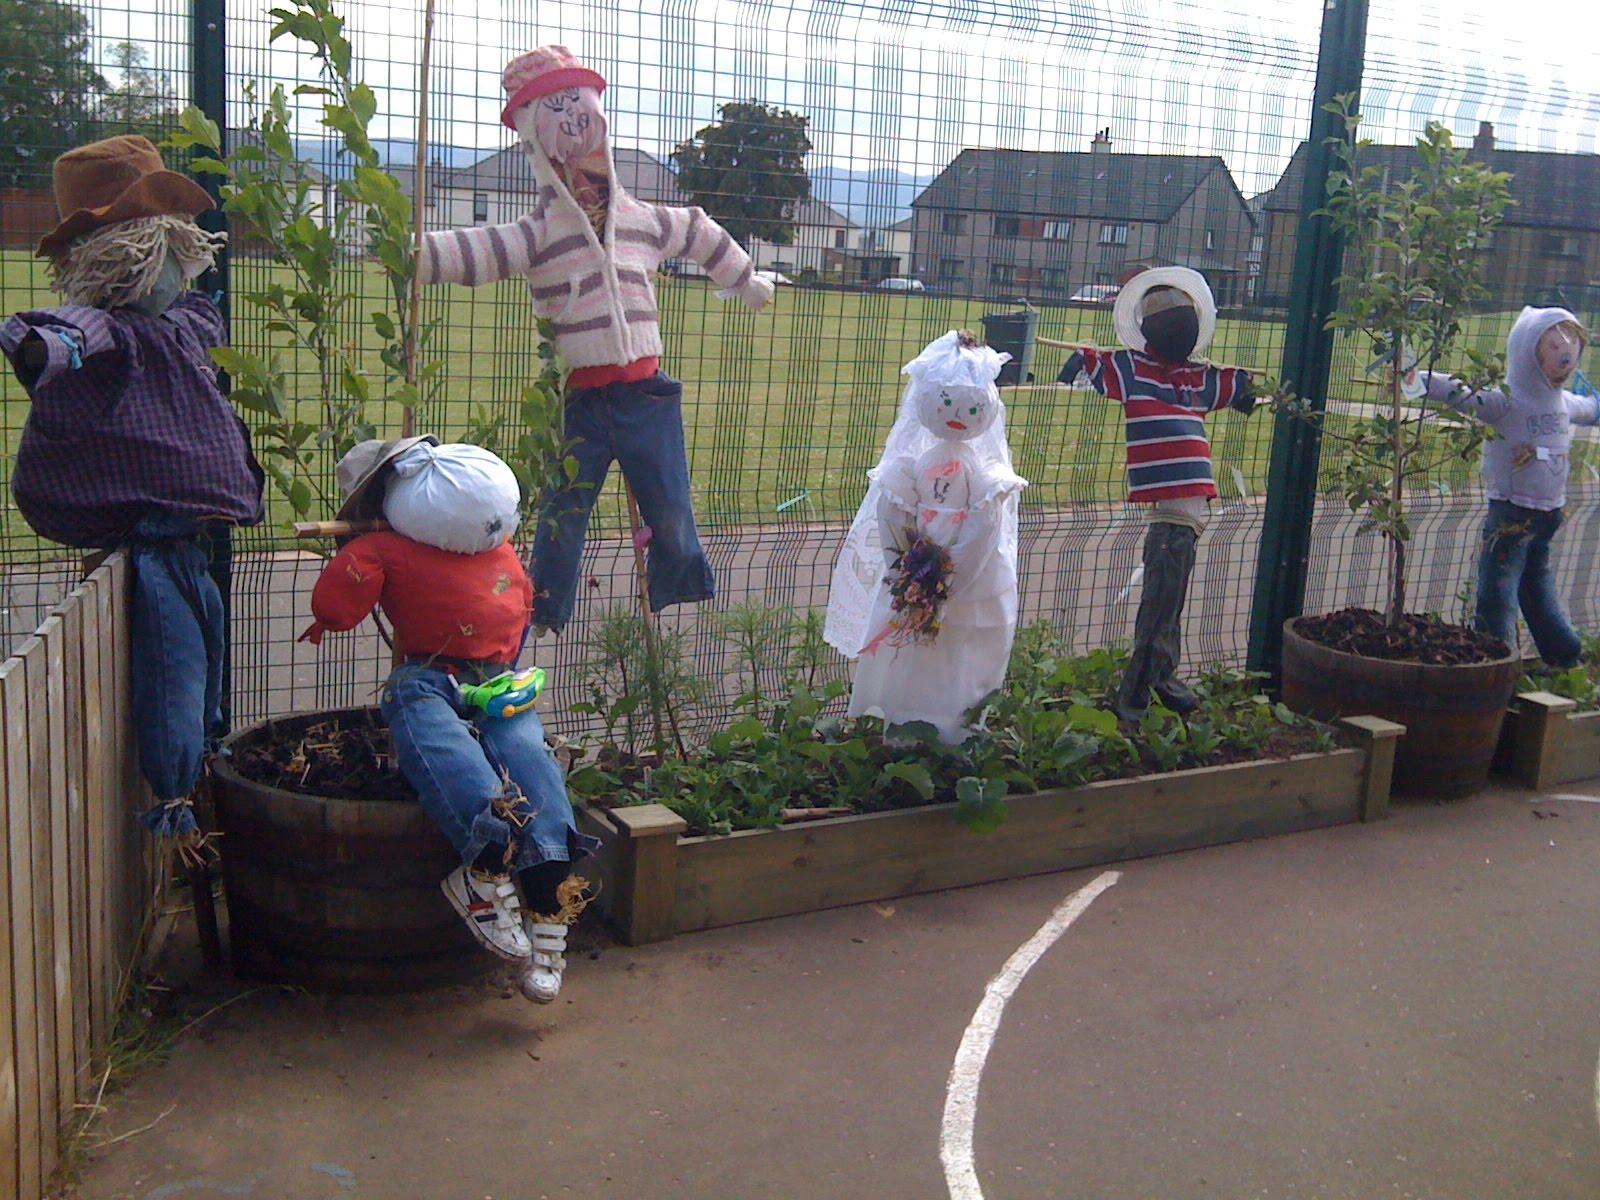 Garden Design Nursery nursery school garden ideas - native garden design